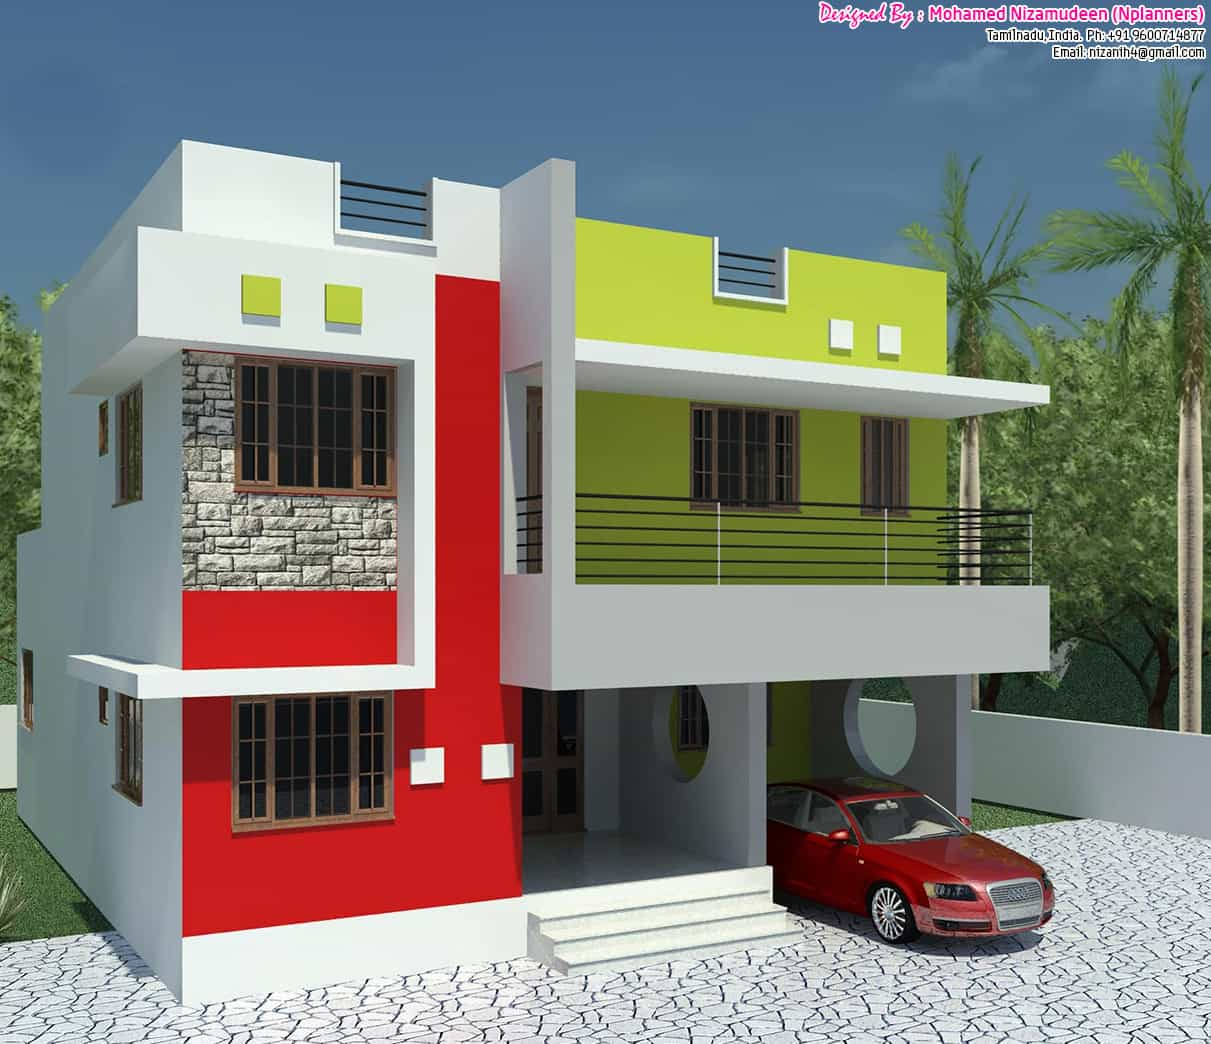 Basic 3bhk Home Design At 1300 Sq Ft